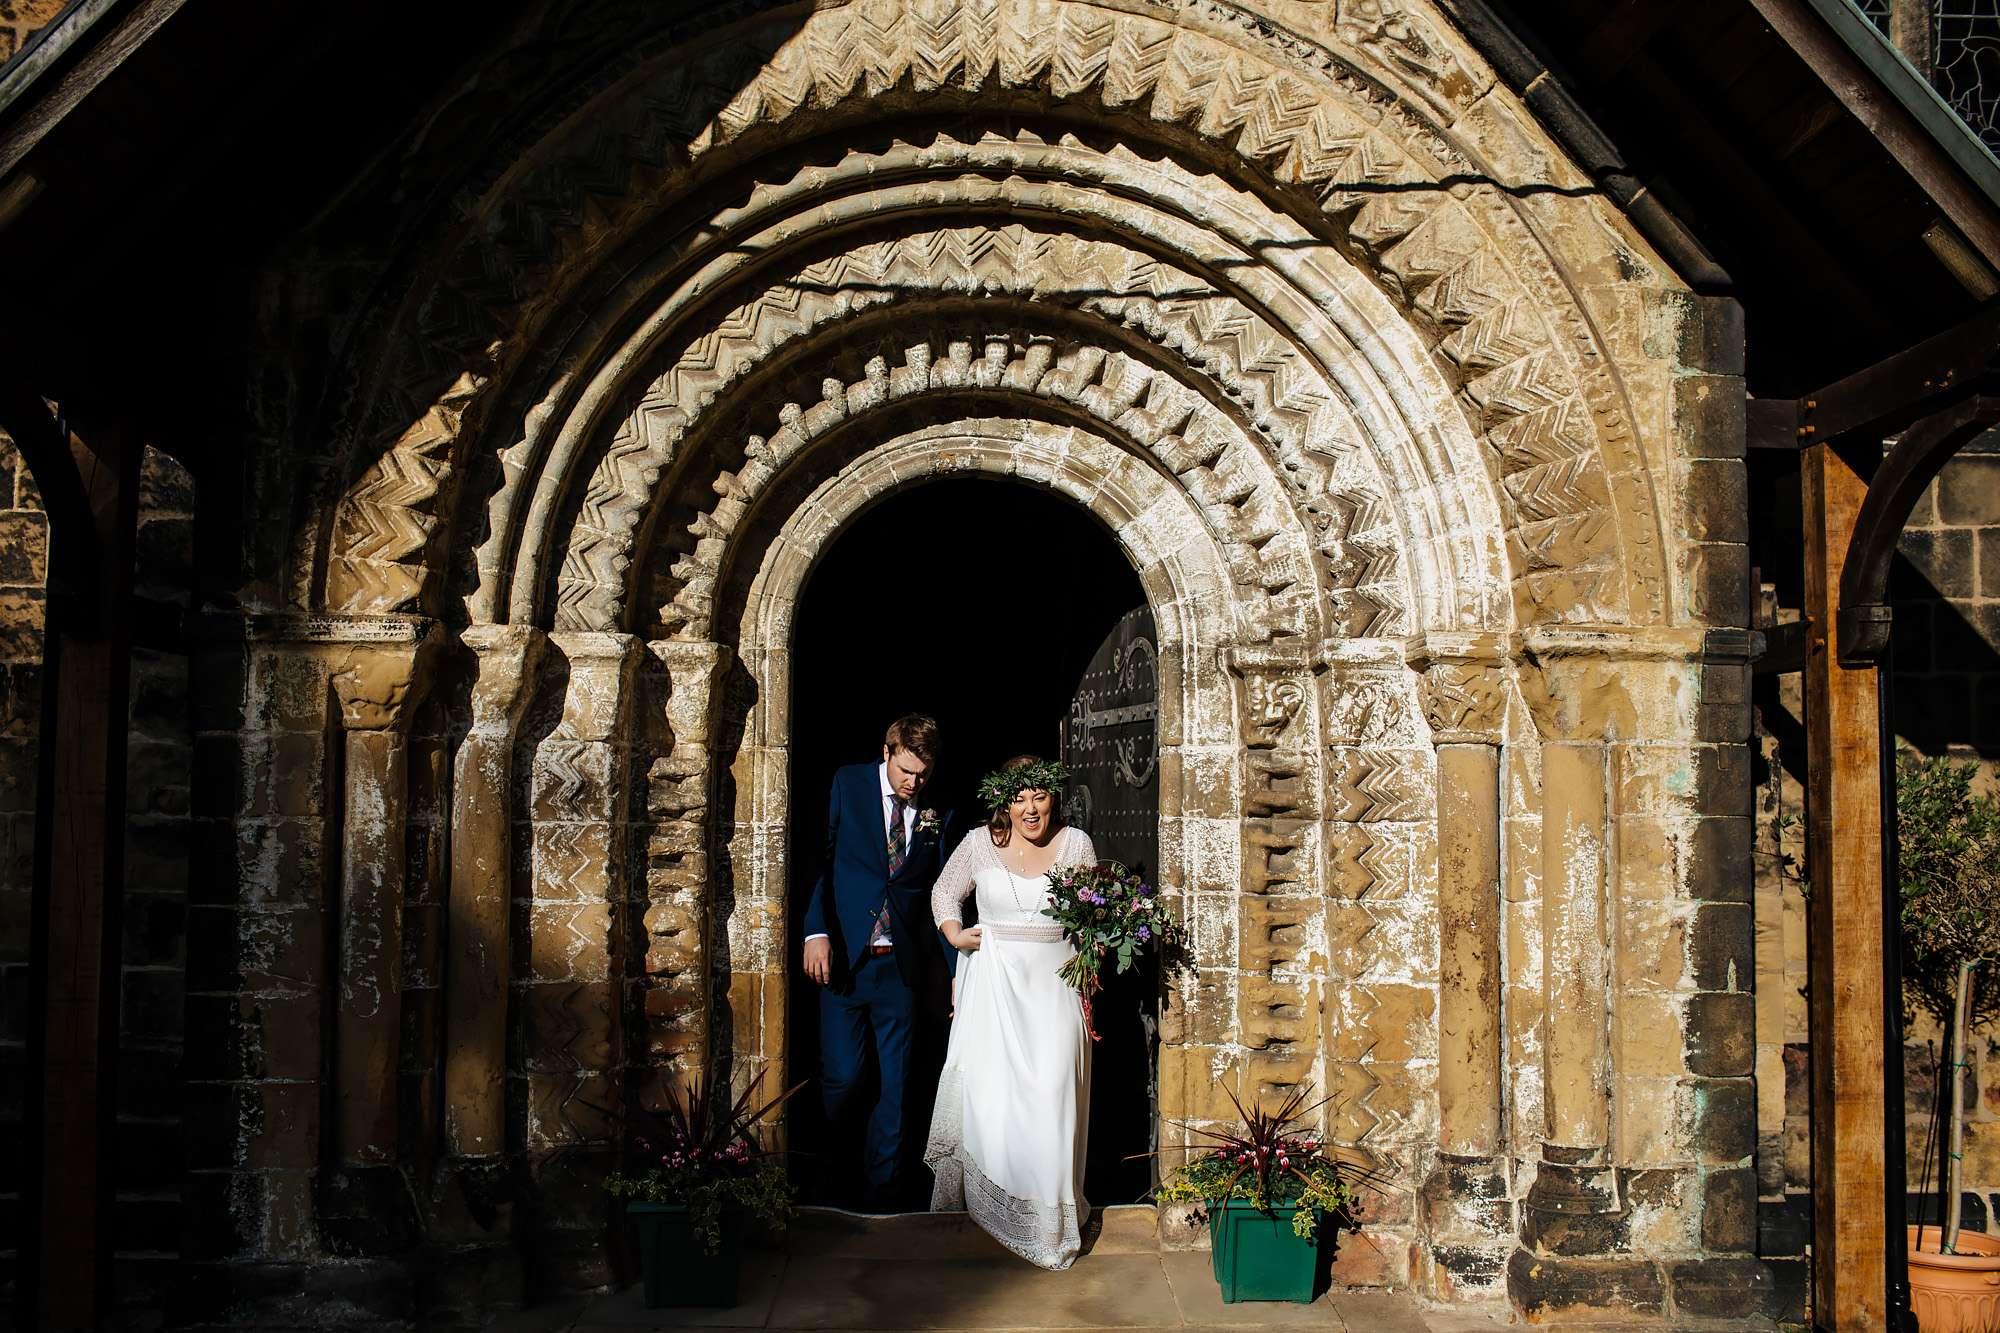 Newlyweds at their church wedding in Leeds